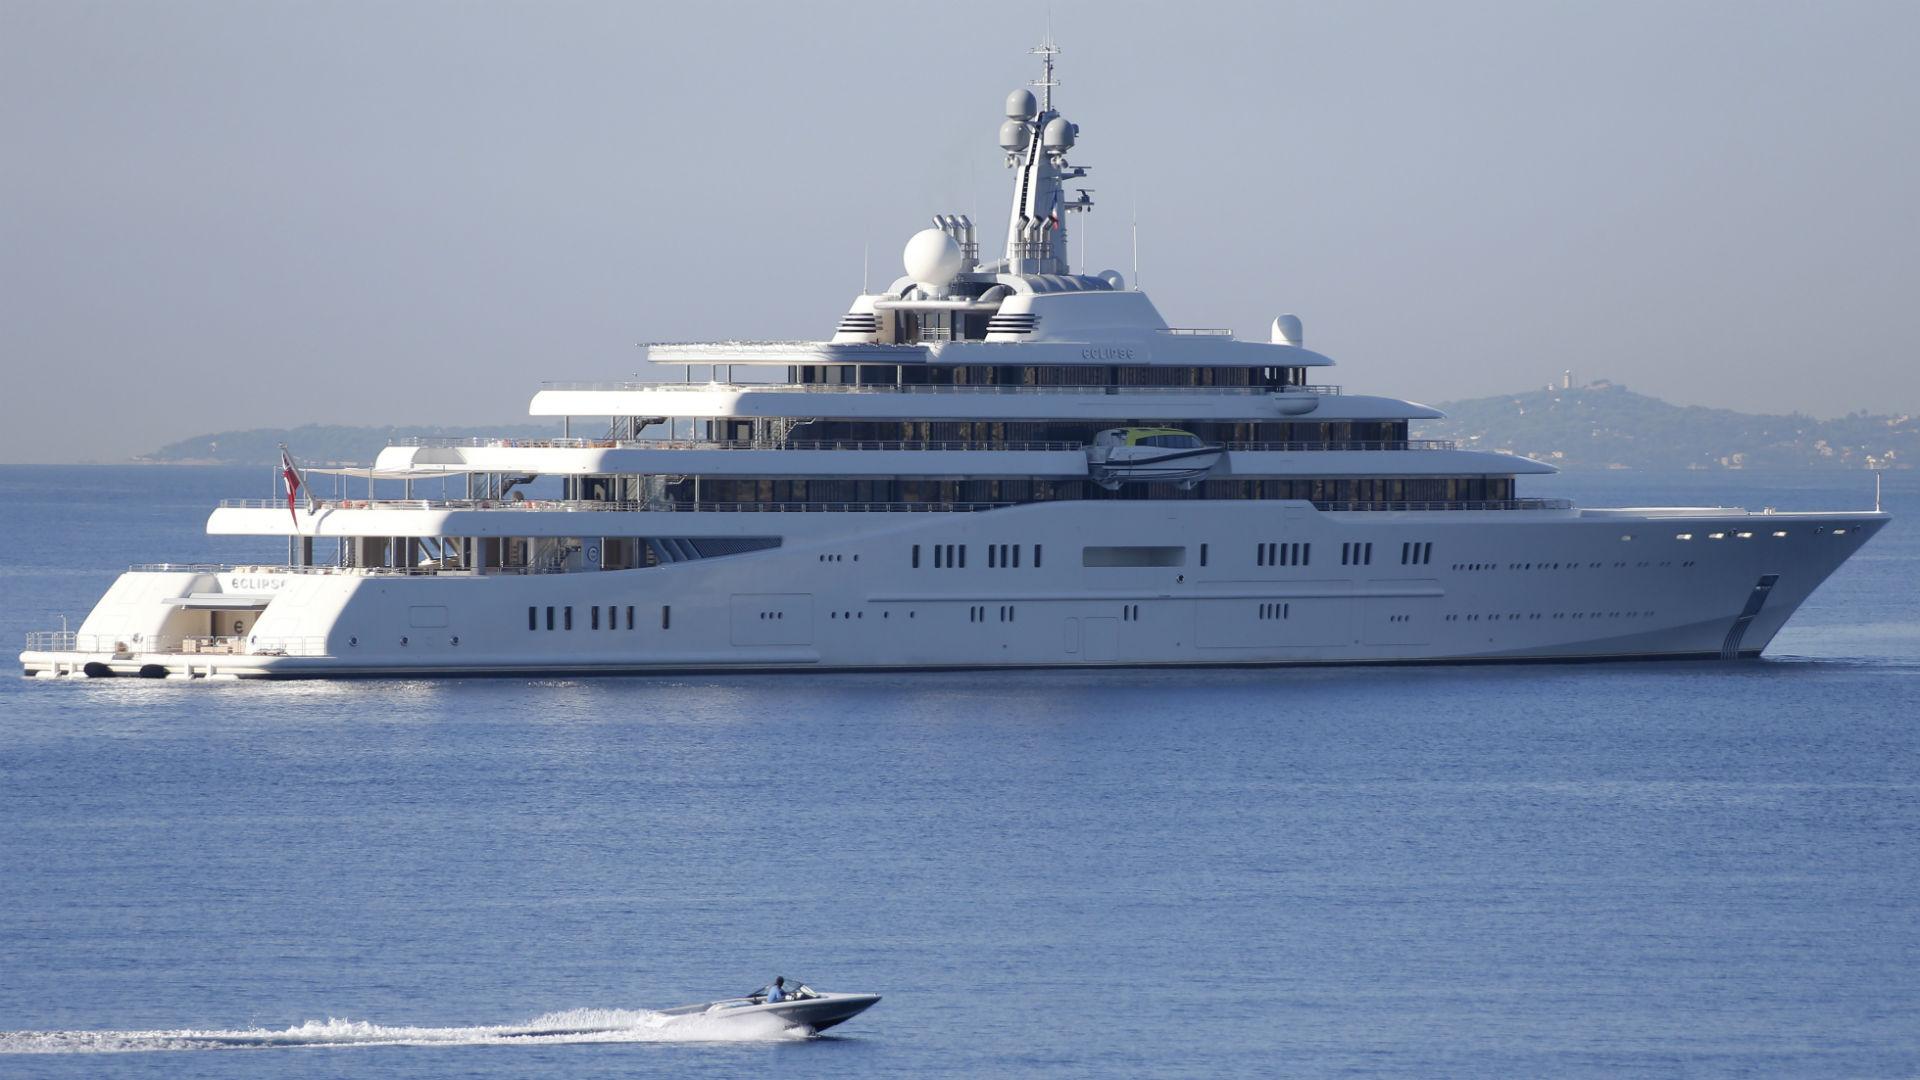 Roman Abramovic yacht Eclipse